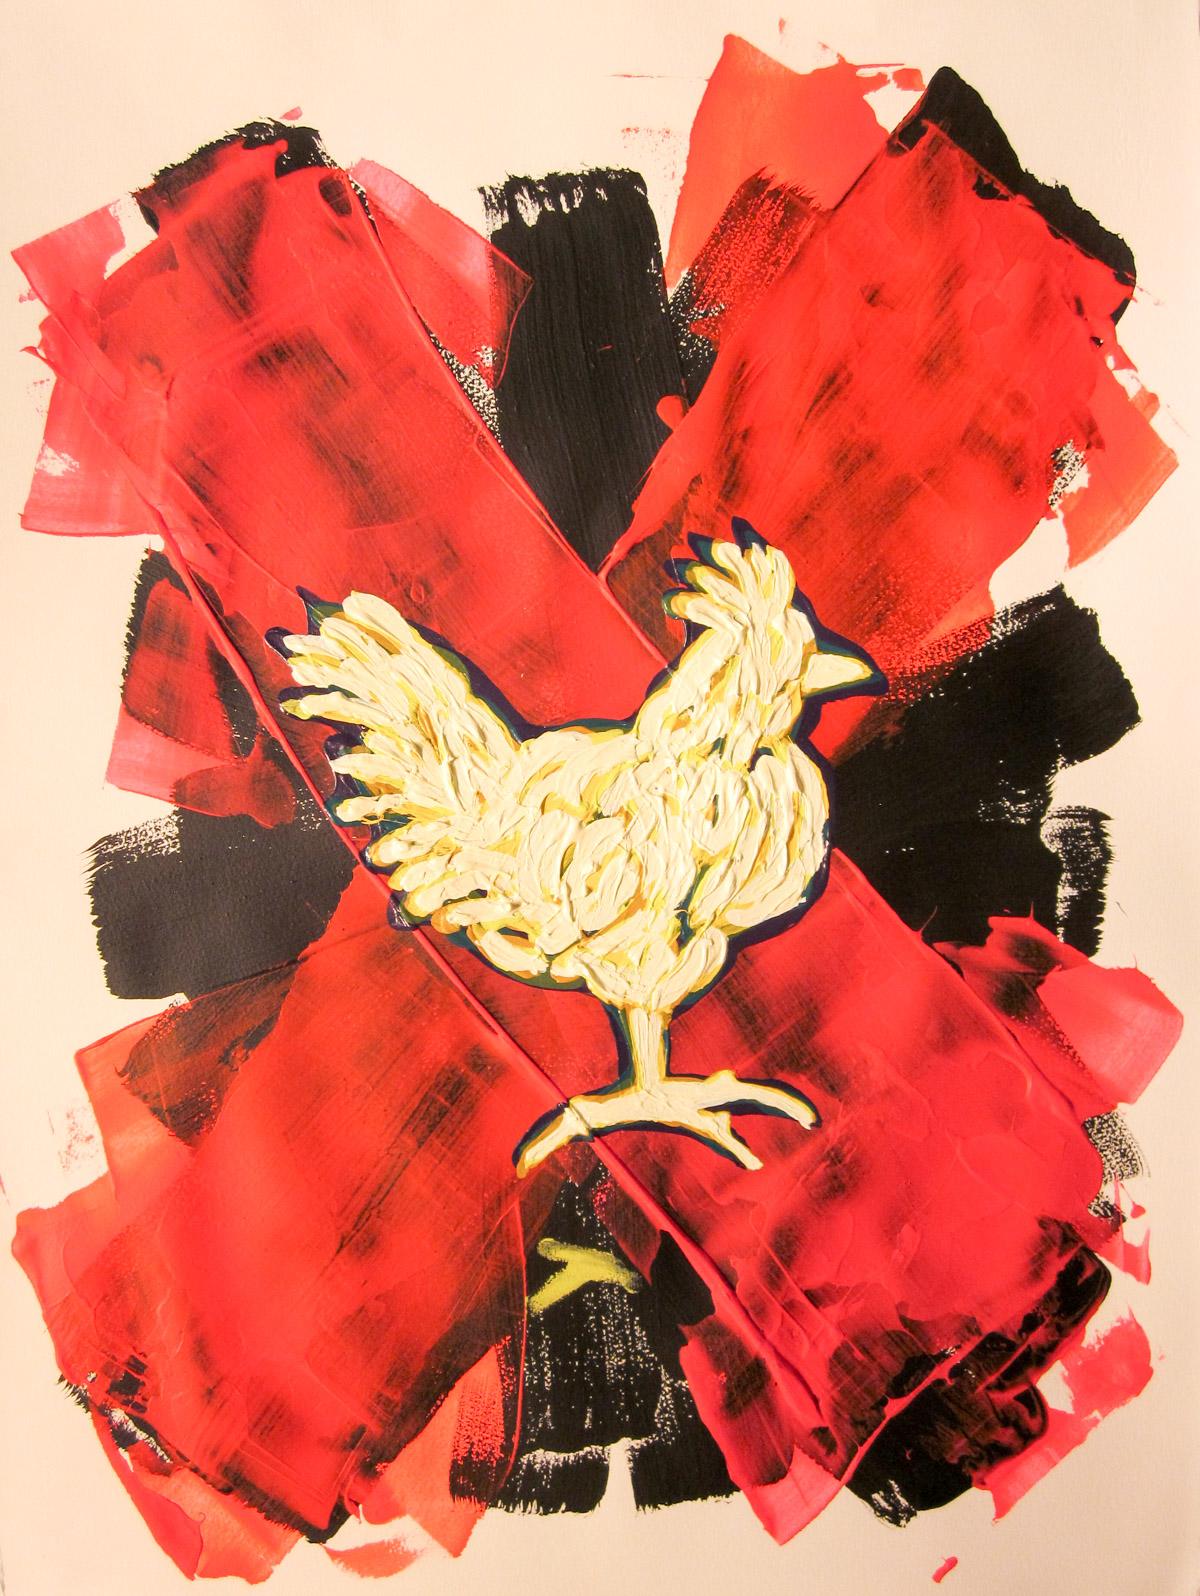 X+Chicken+#1_2015.jpg